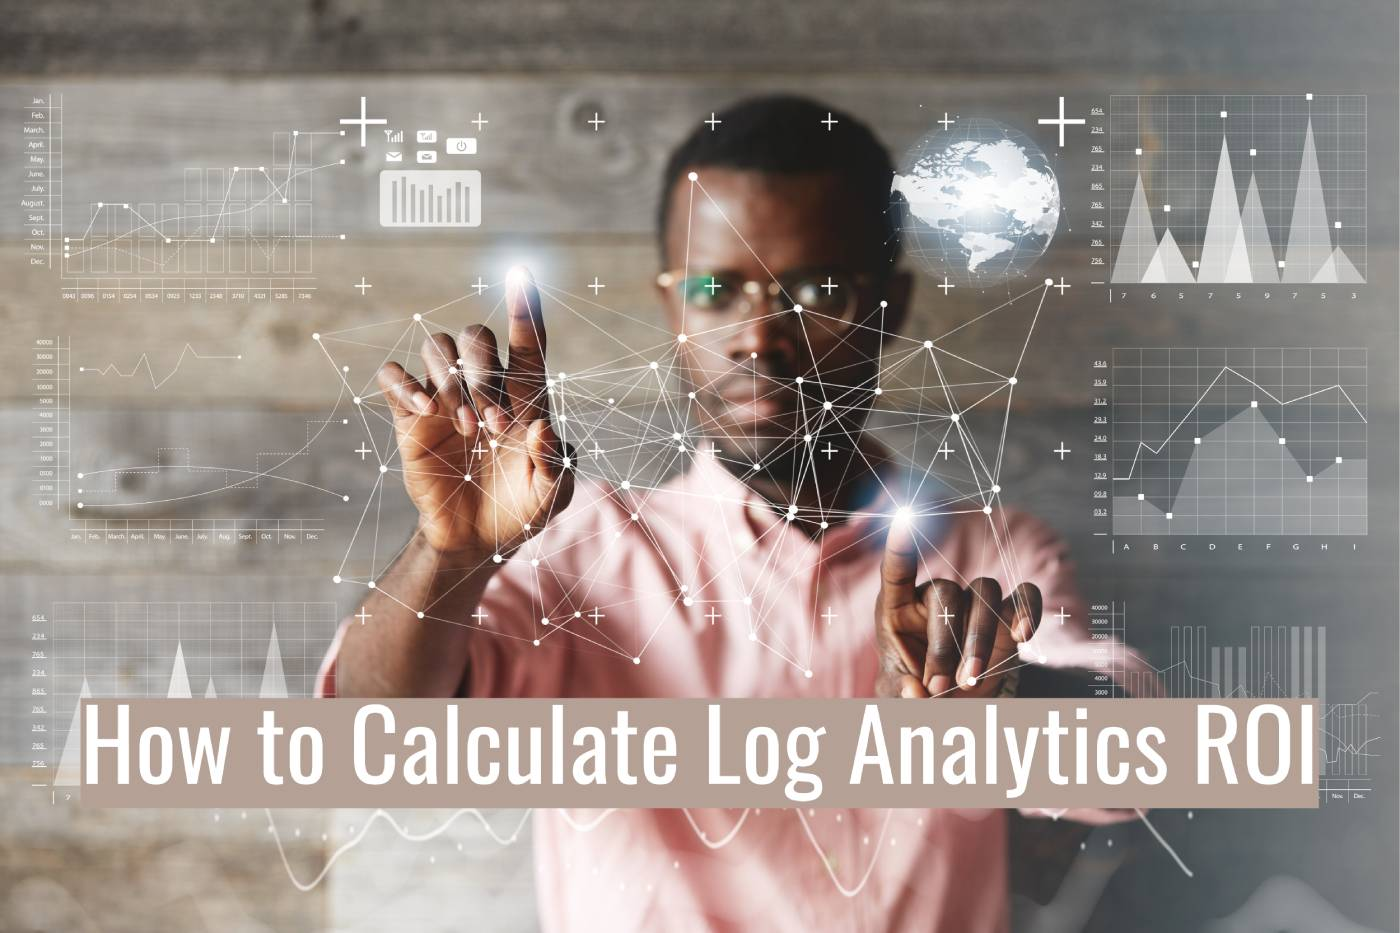 How to Calculate Log Analytics ROI